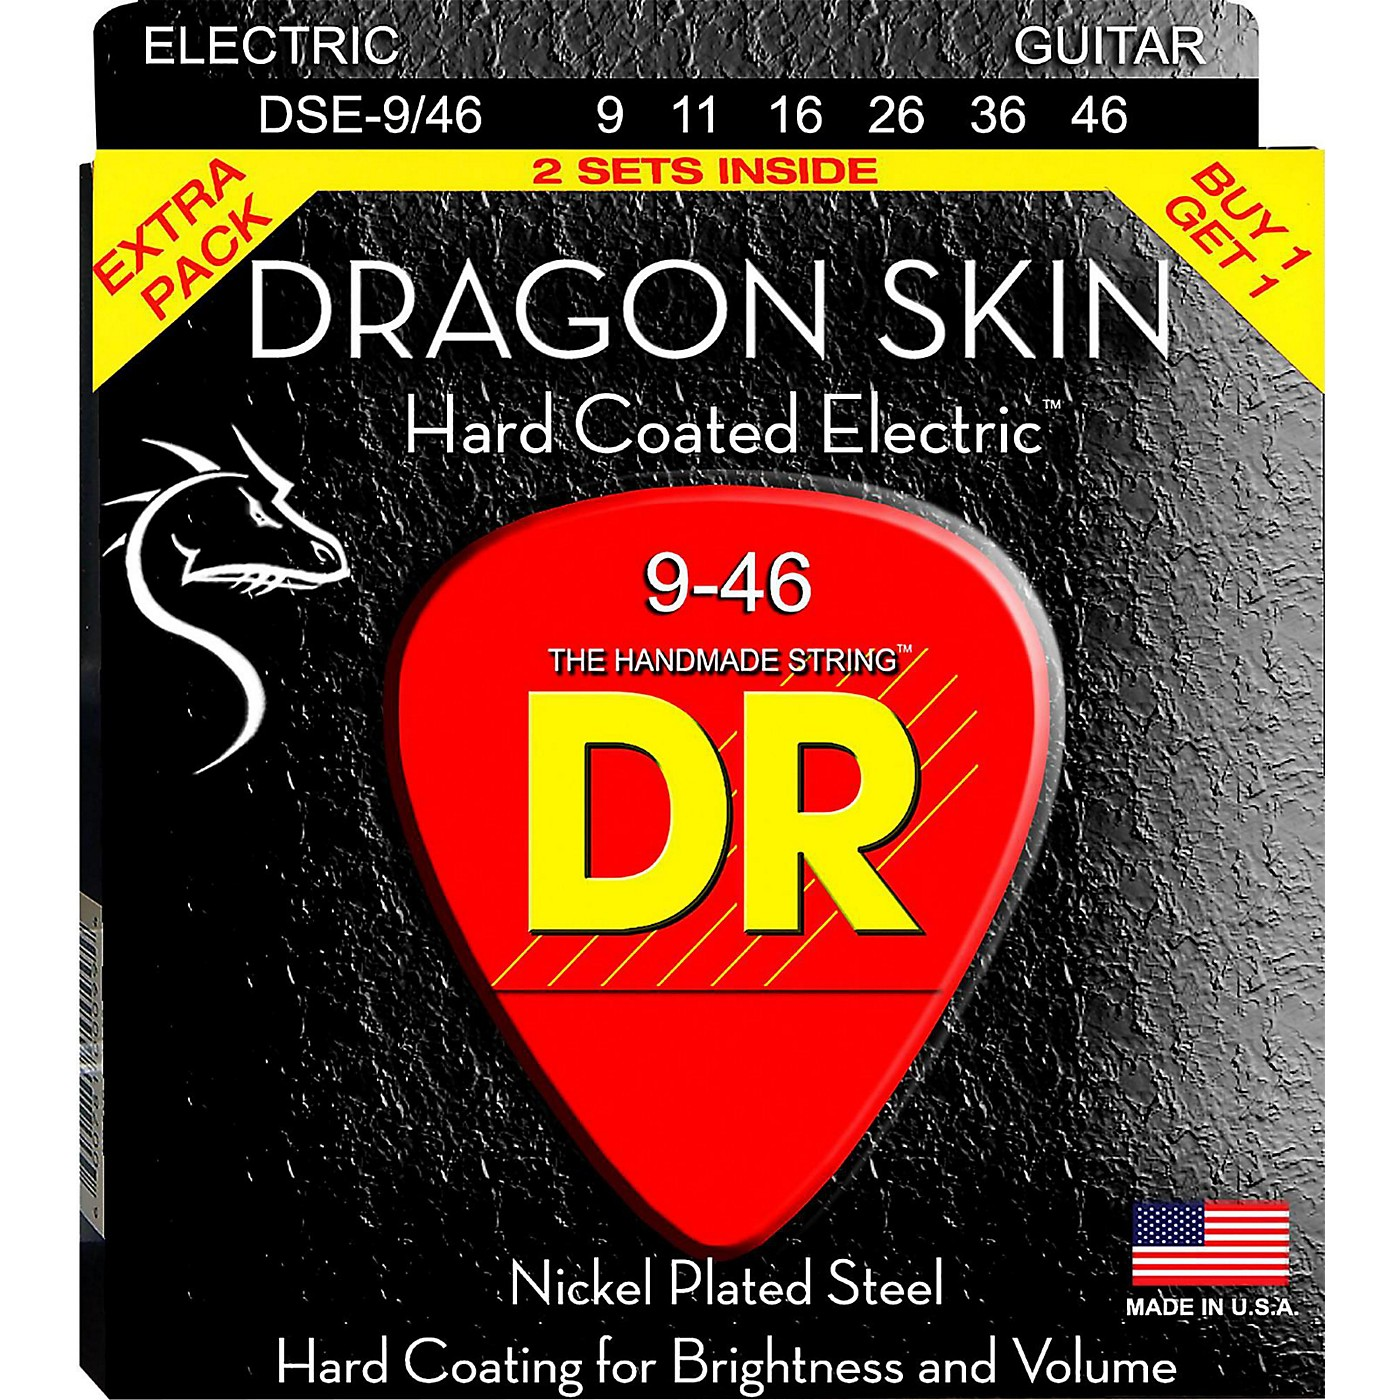 DR Strings Dragon Skin (2 Pack) Hard Coated Electric Guitar Strings (9-46) thumbnail